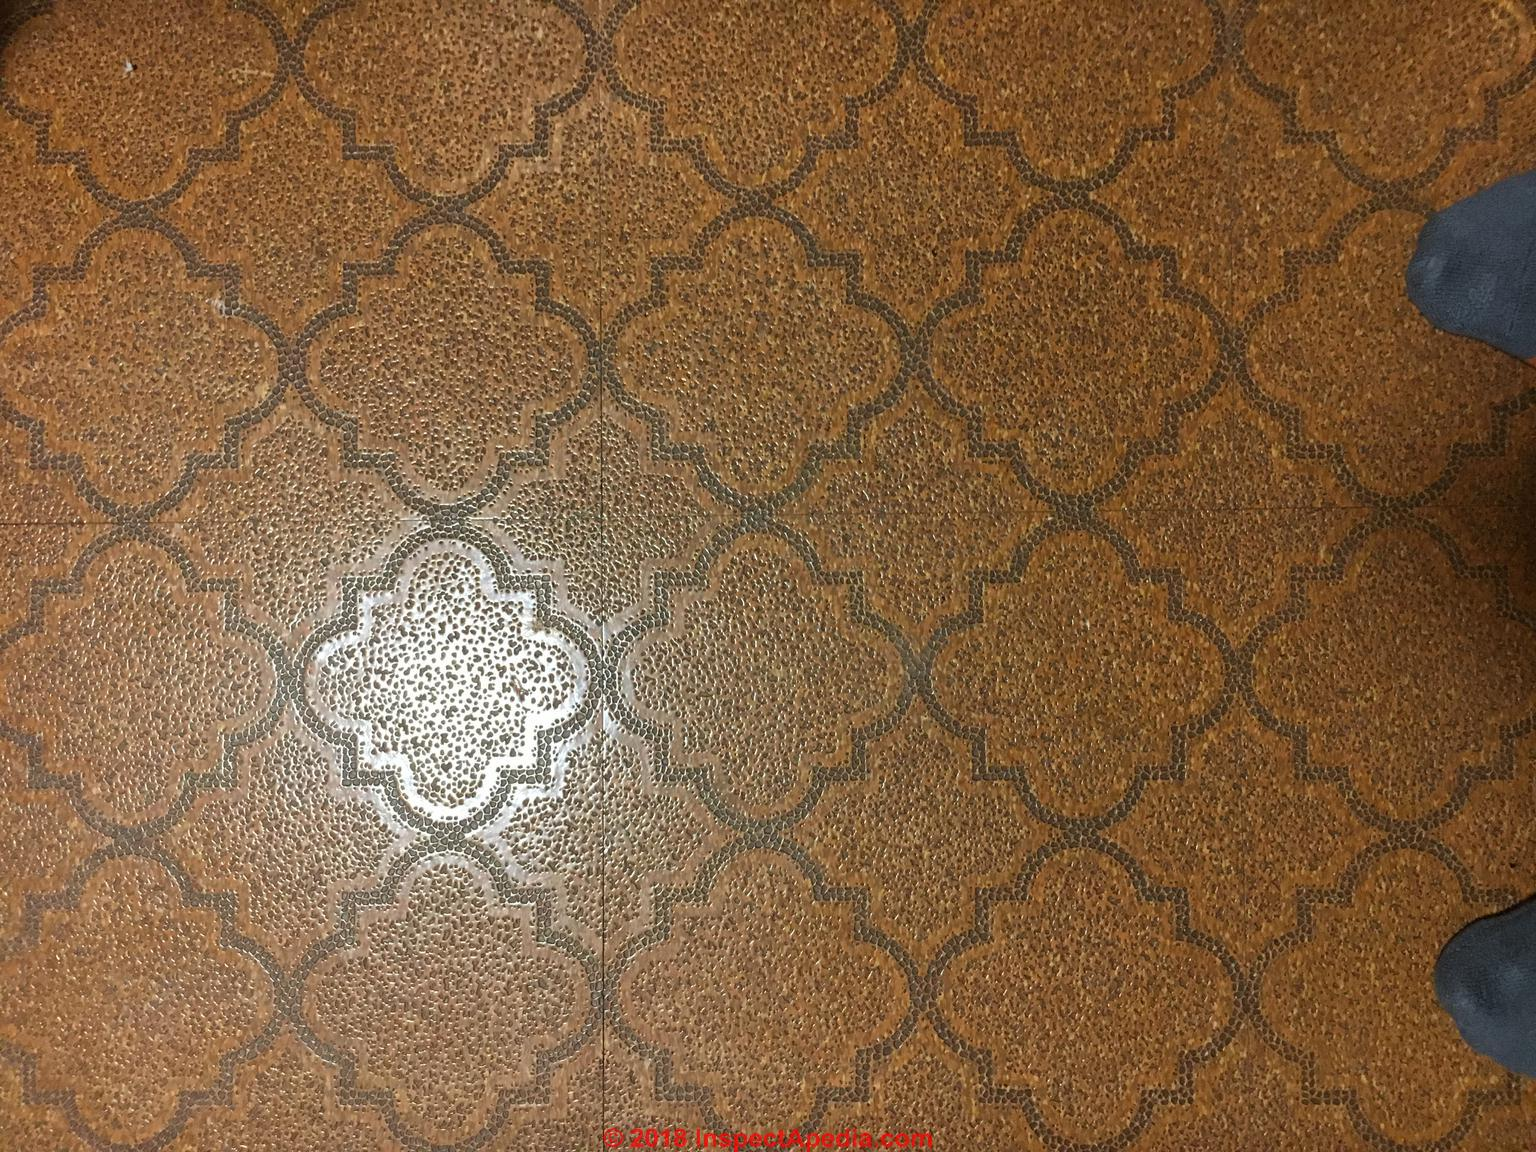 Qa On Indentifying Asbestos Containing Floor Tiles Set 5 Asbestos